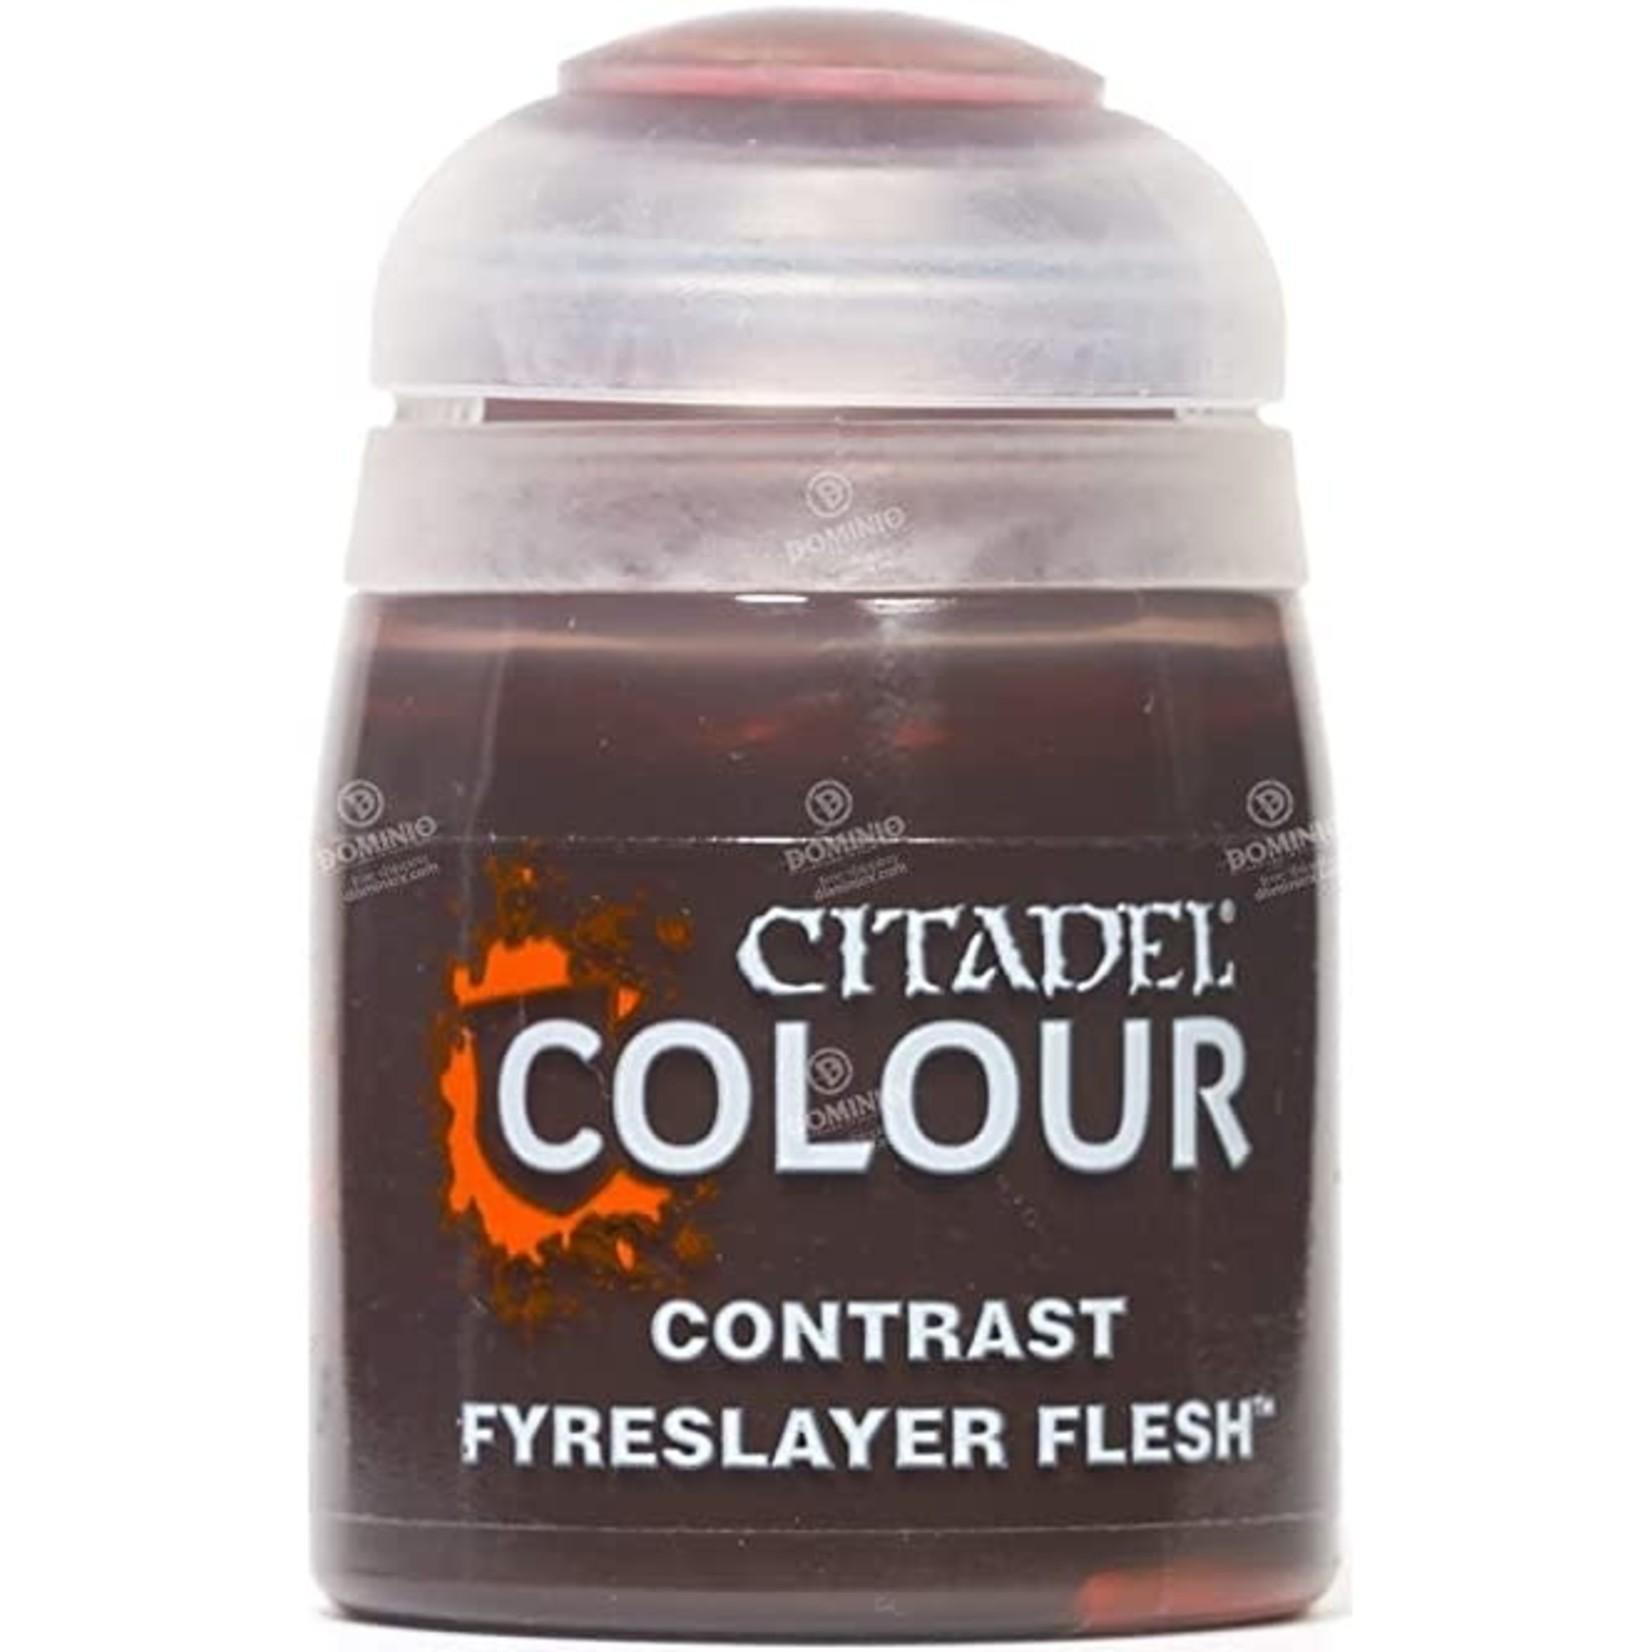 Games Workshop Citadel Paint: Fyreslayer Flesh Contrast (18 ml)